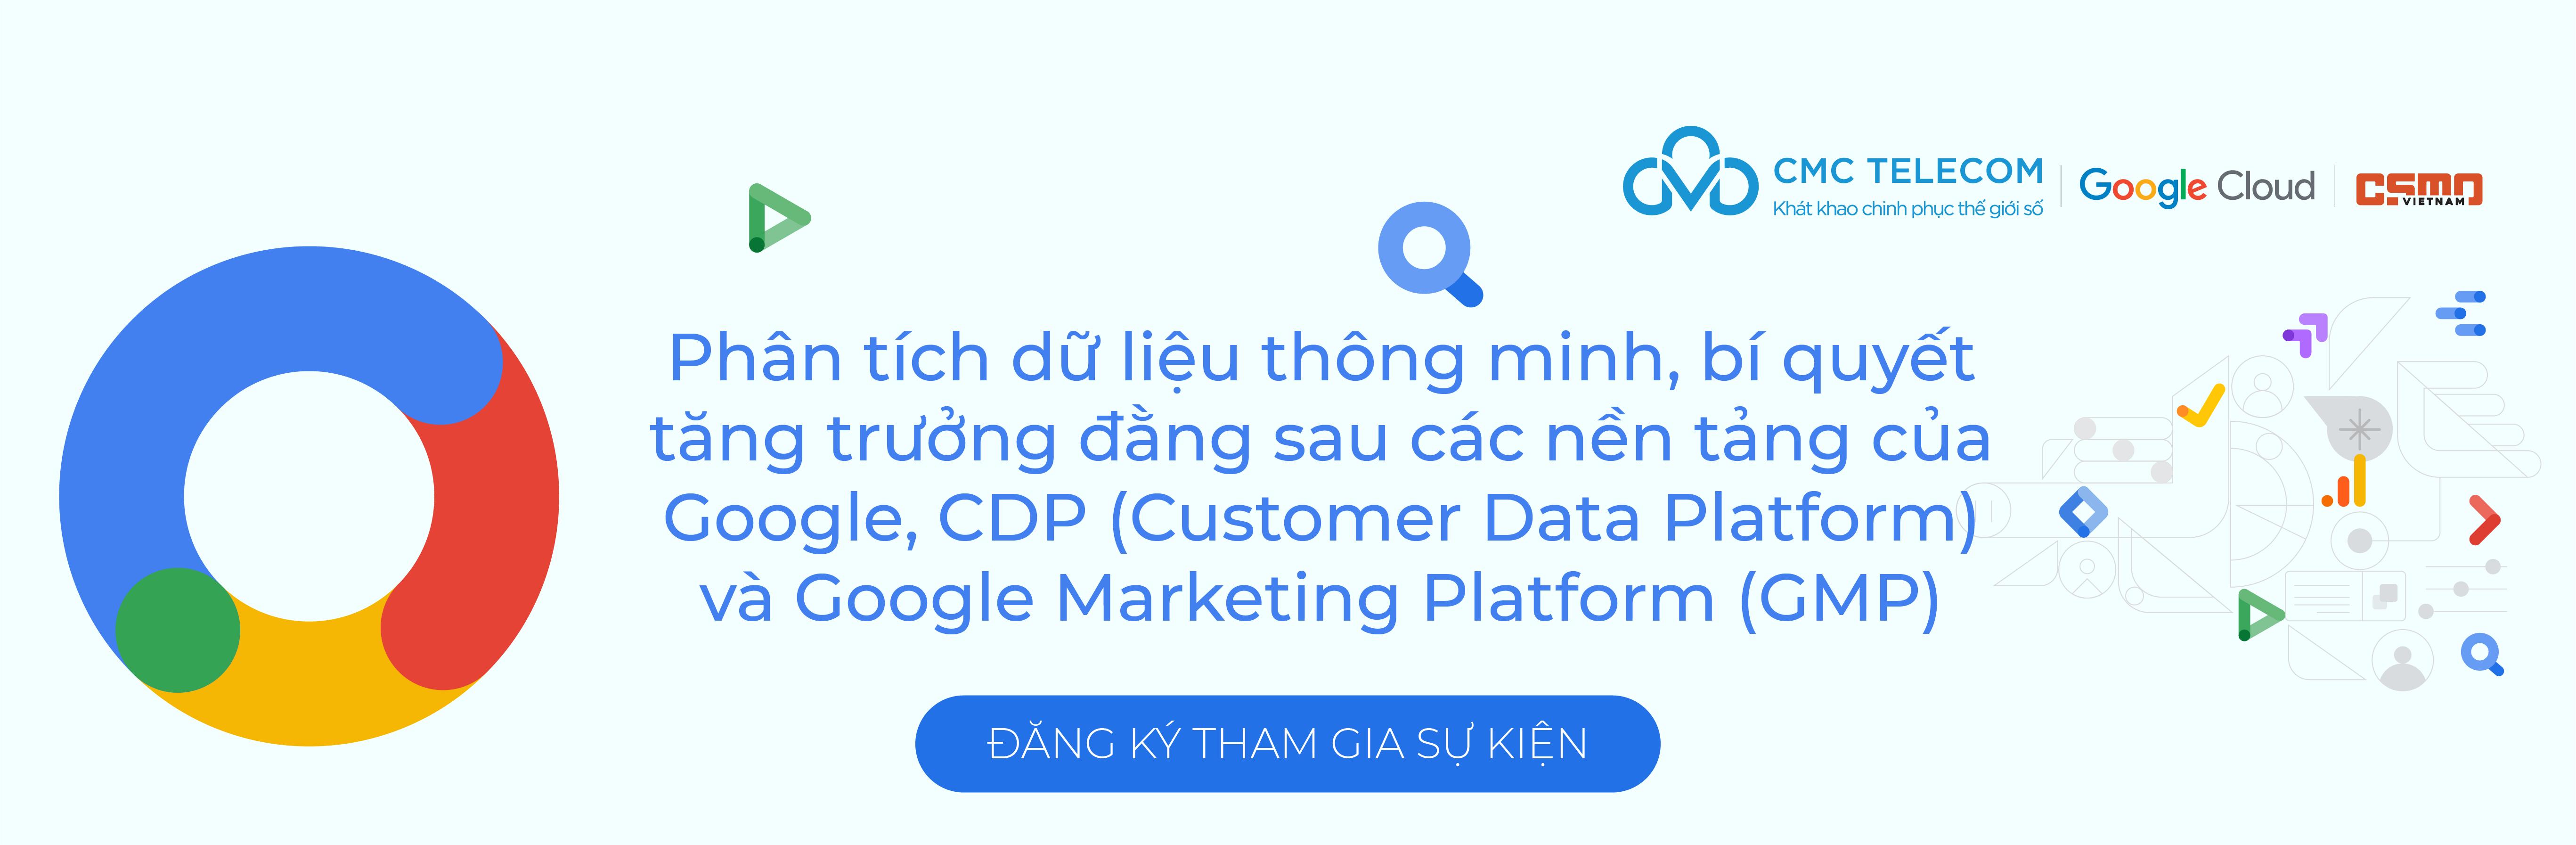 Banner su kien CDP Google Cloud